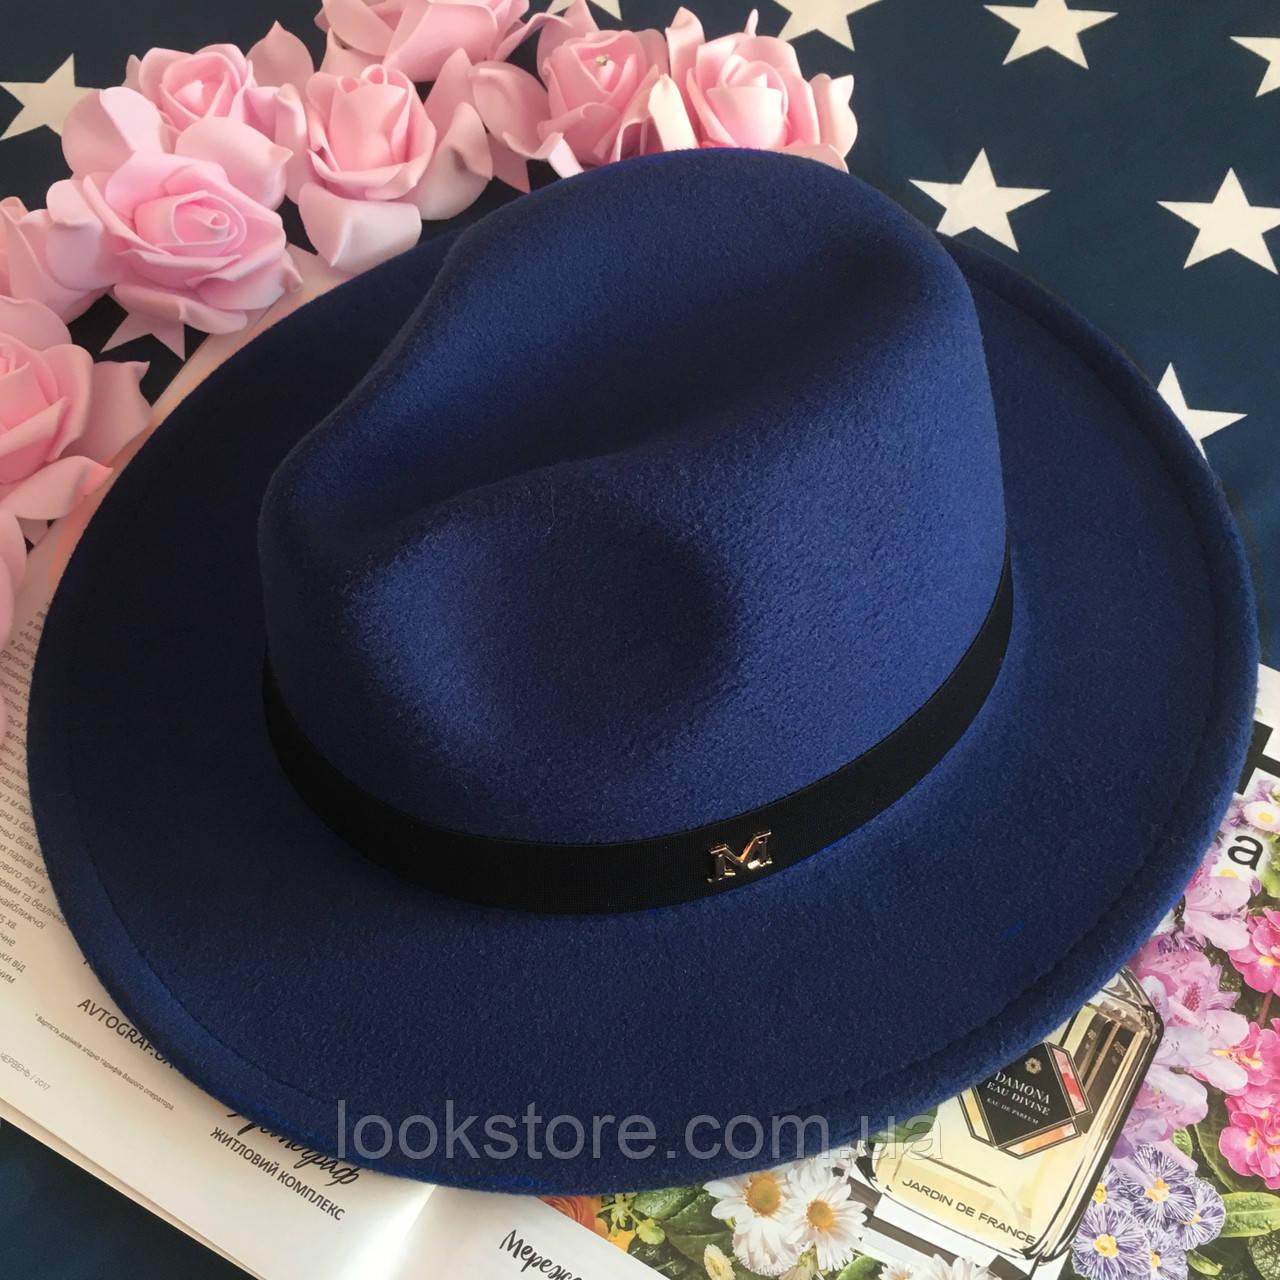 Шляпа Федора унисекс с устойчивыми полями в стиле Maison Michel темно синяя